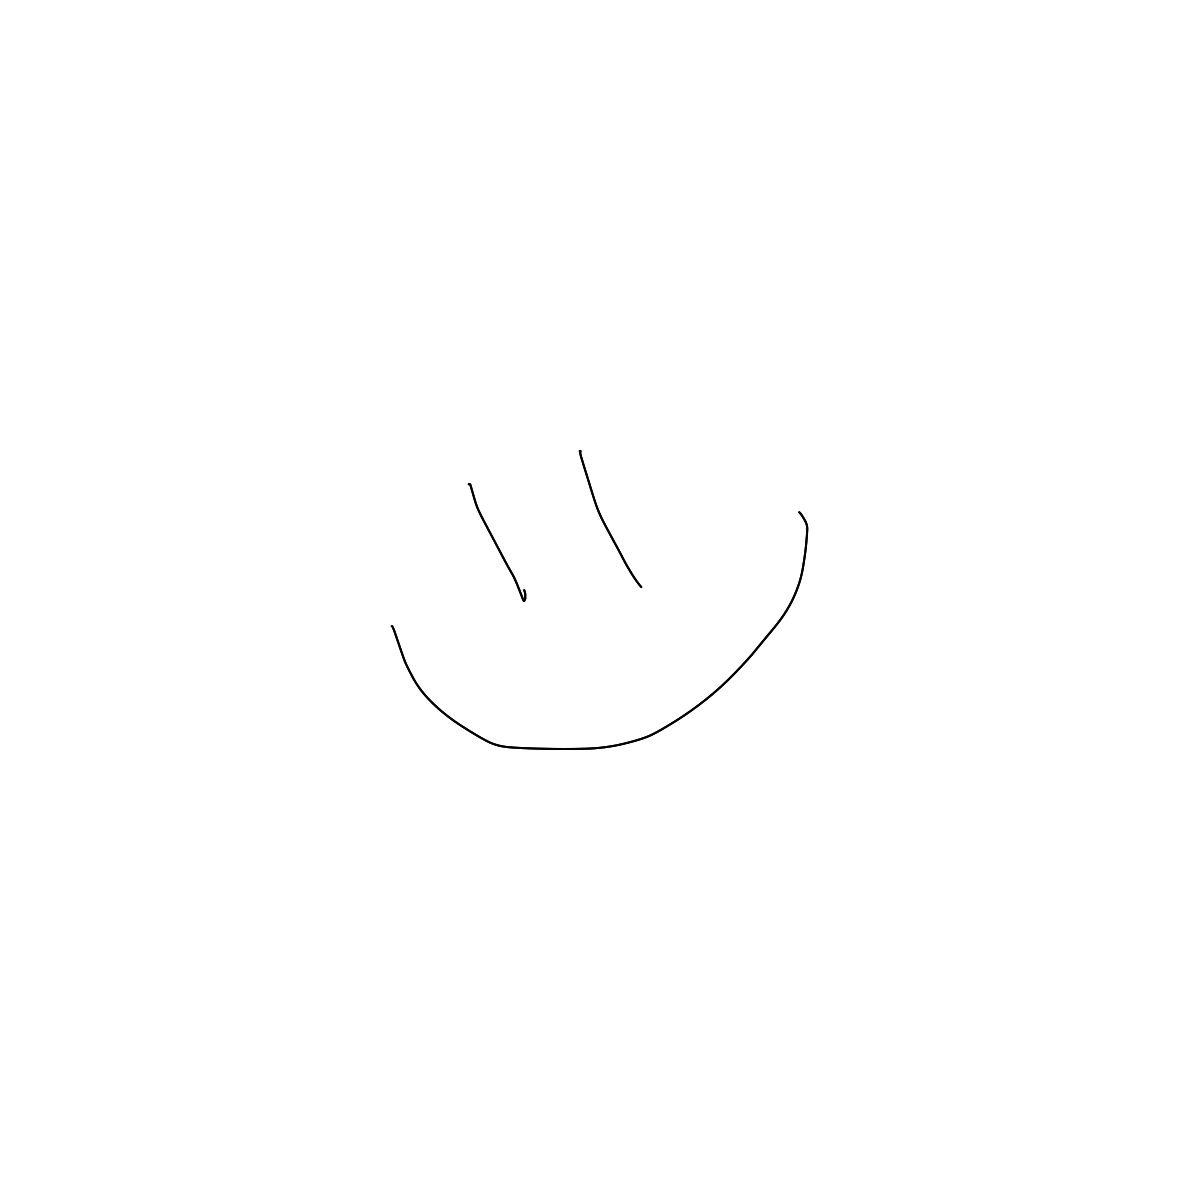 BAAAM drawing#9134 lat:60.7403717041015600lng: 8.1079120635986330